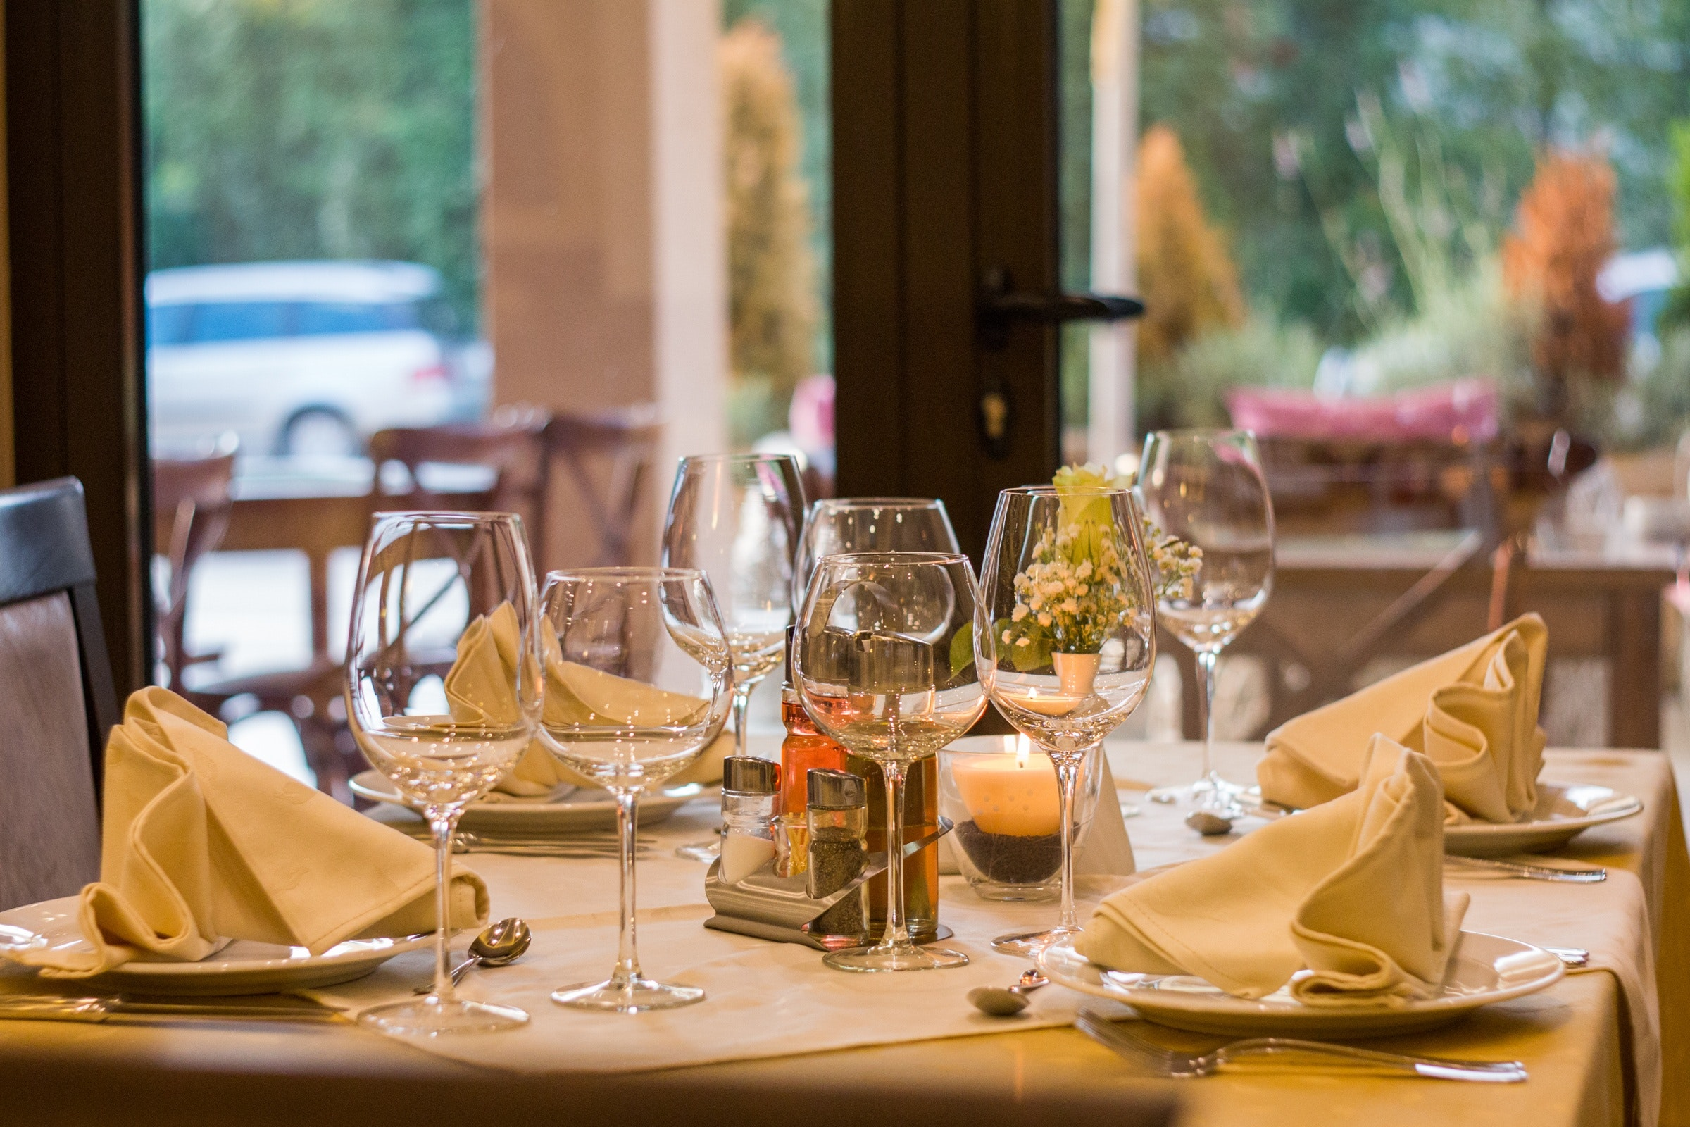 fine dining restaurant table